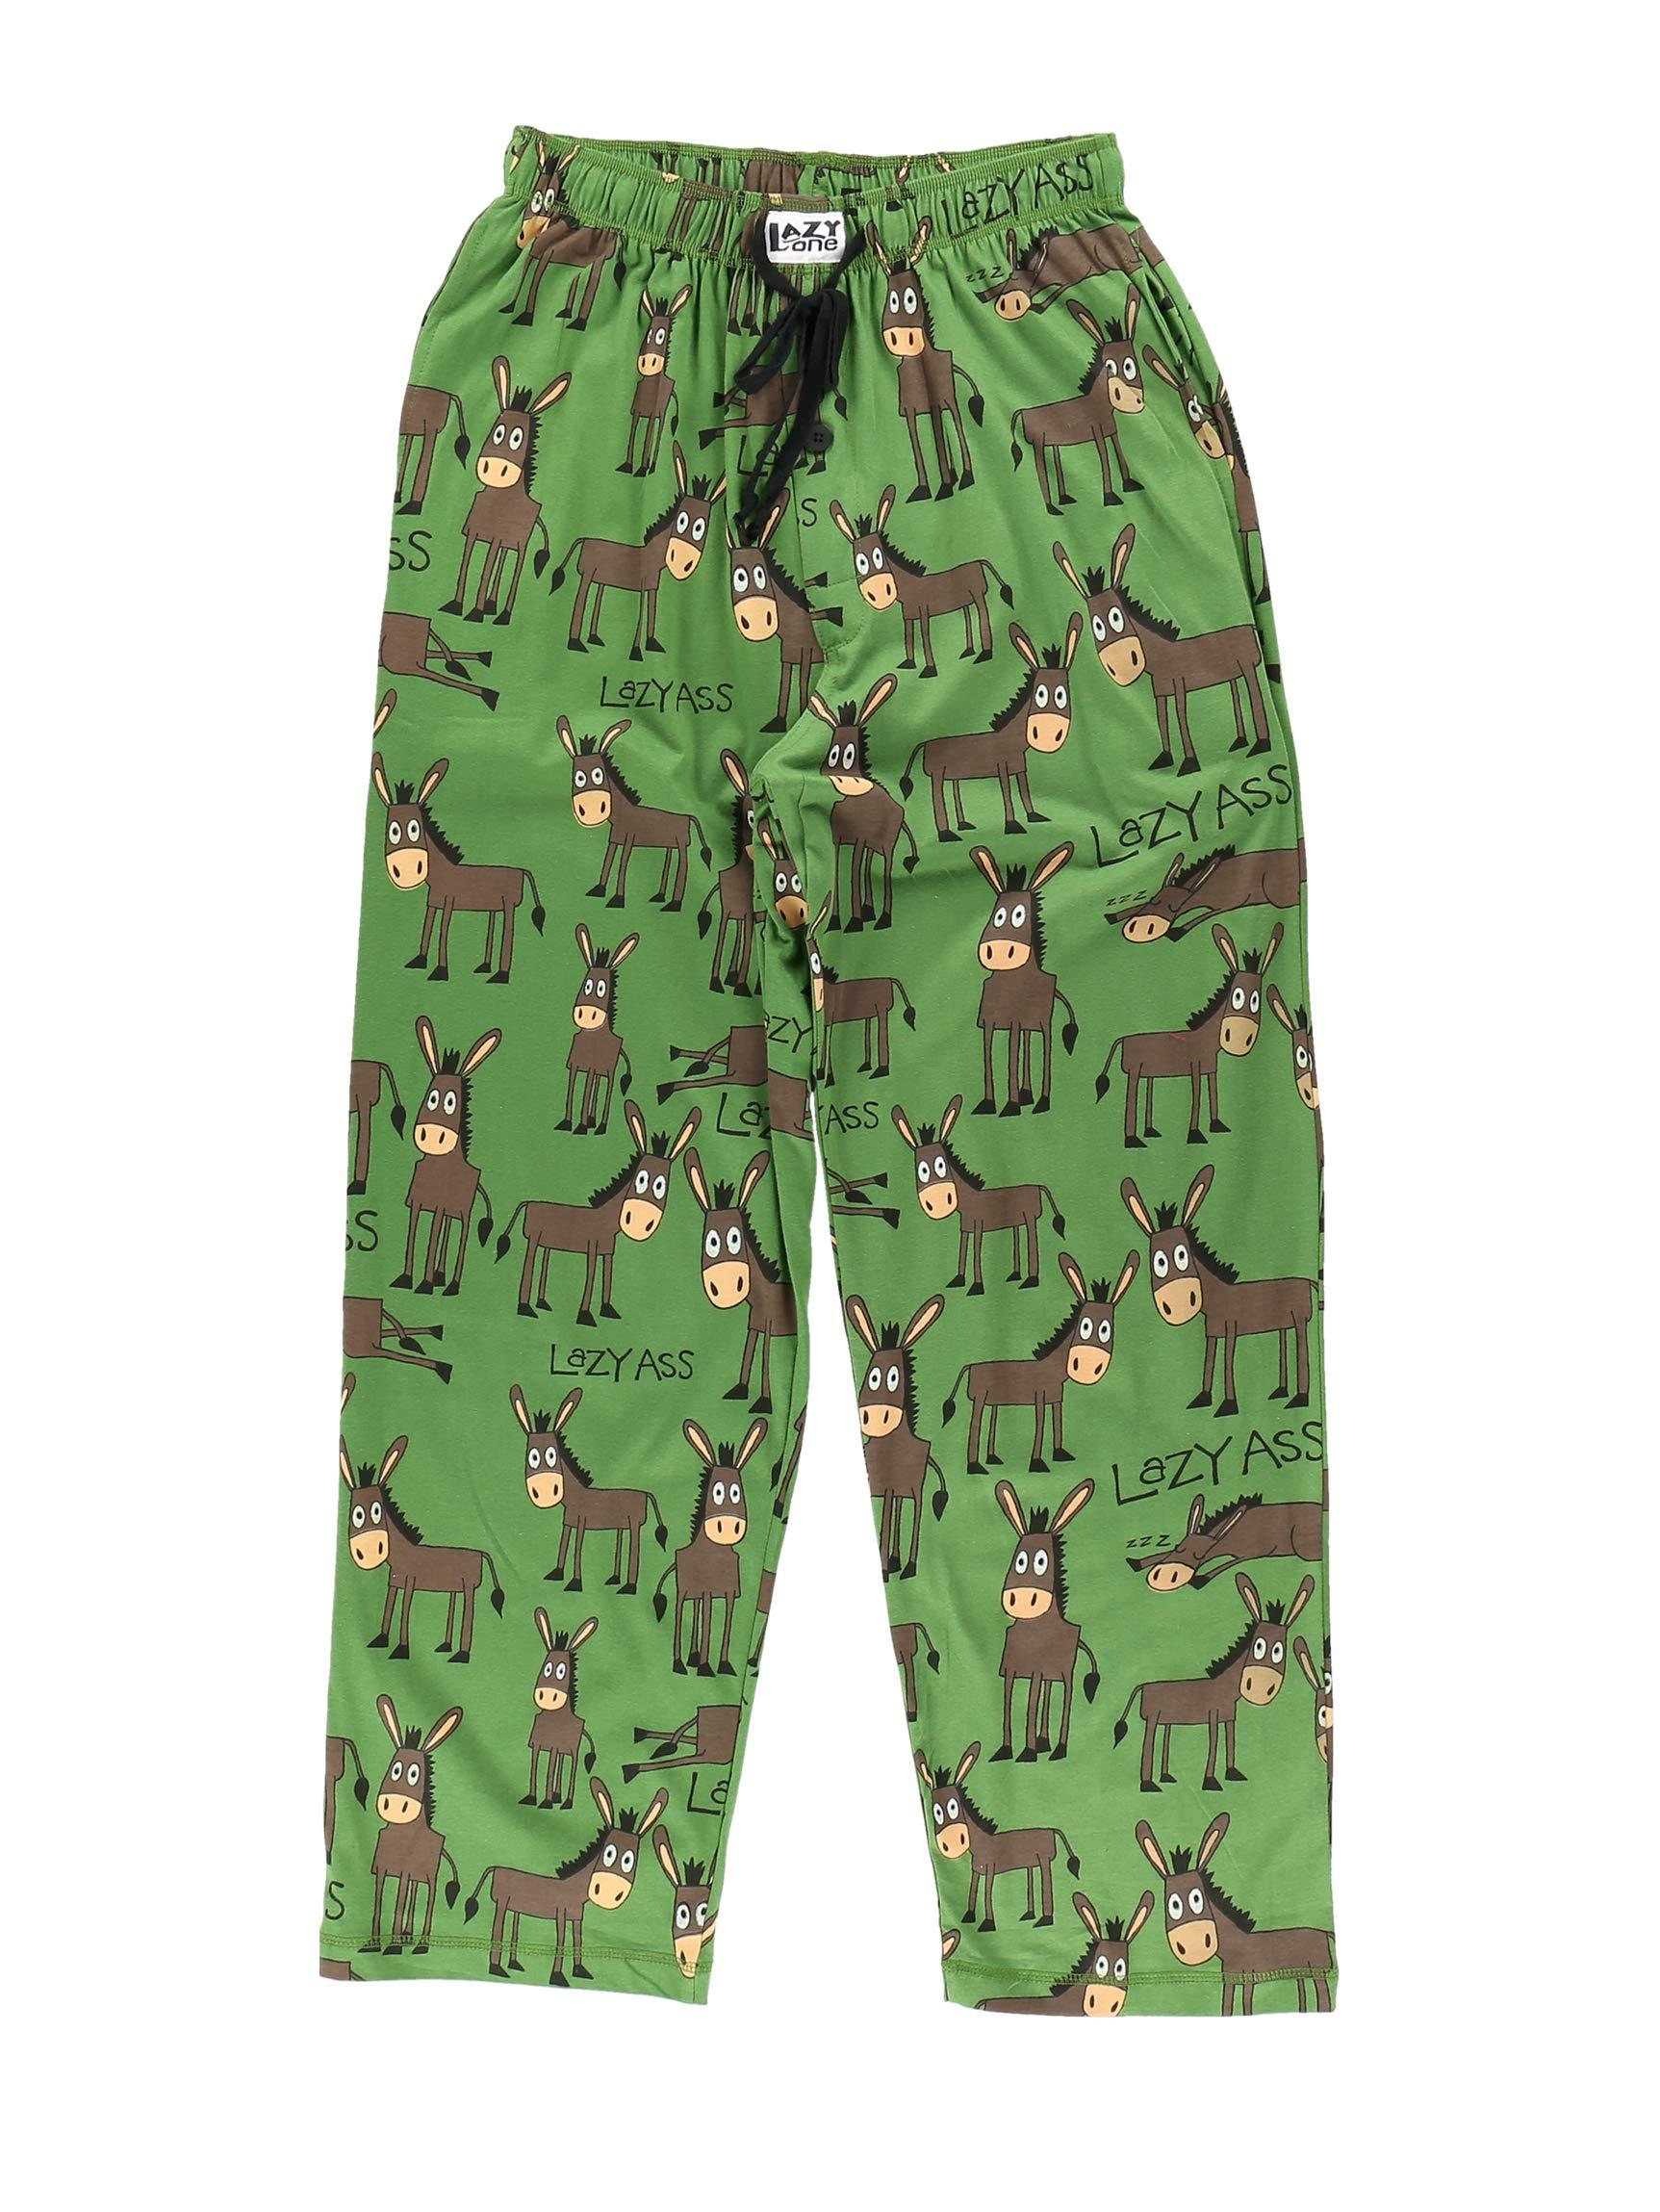 Image of Funny Lazy Ass Pajama Pants for Men - See More Fun PJ Pants